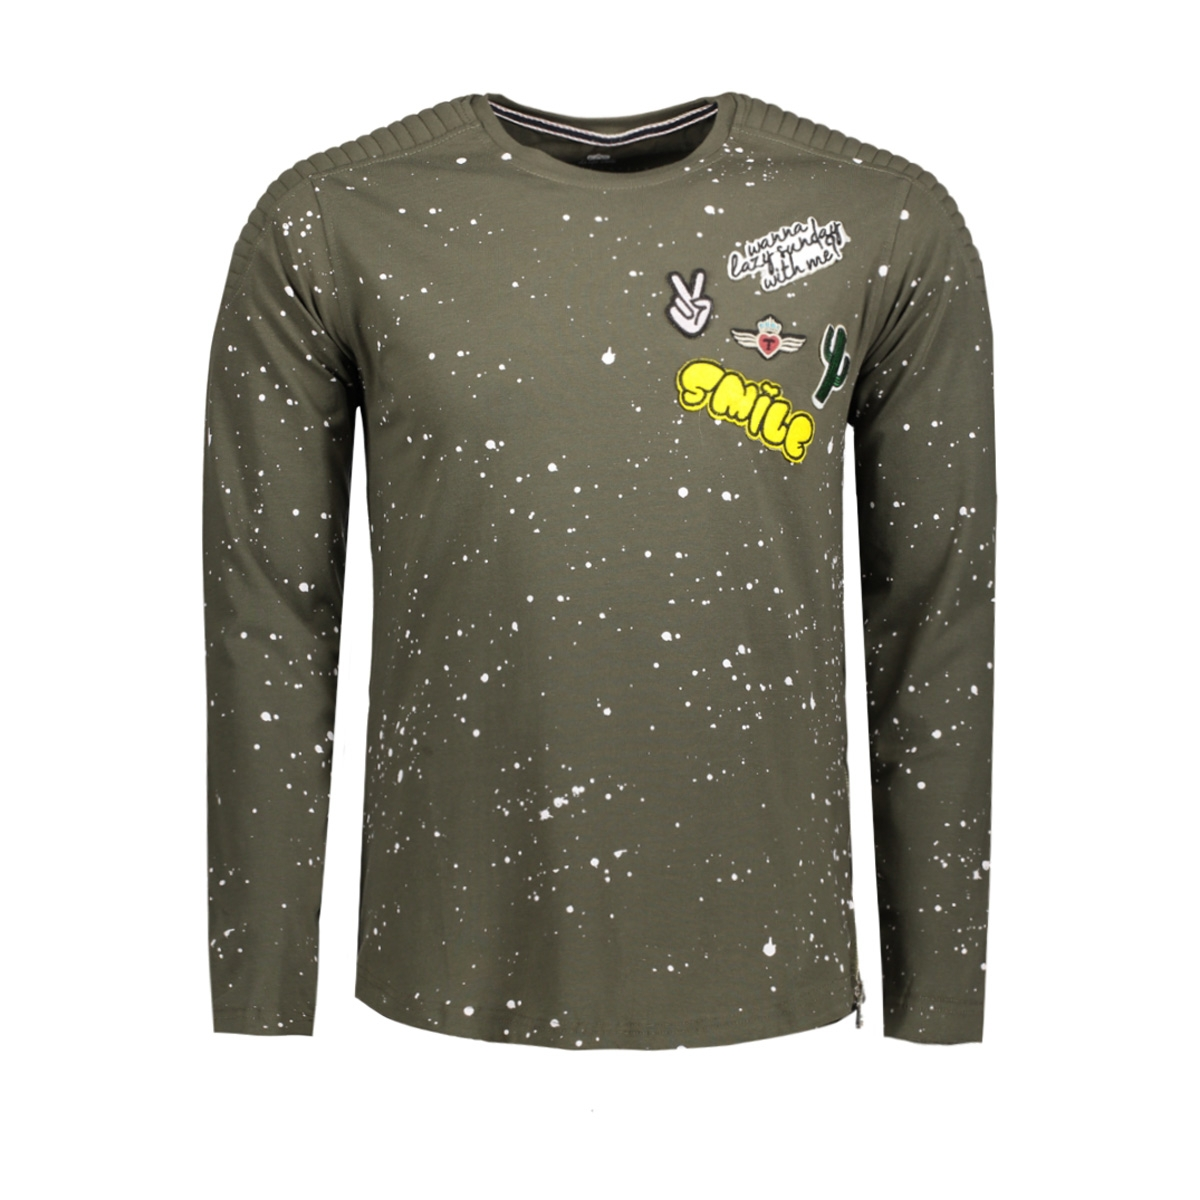 4008 gabbiano t-shirt army